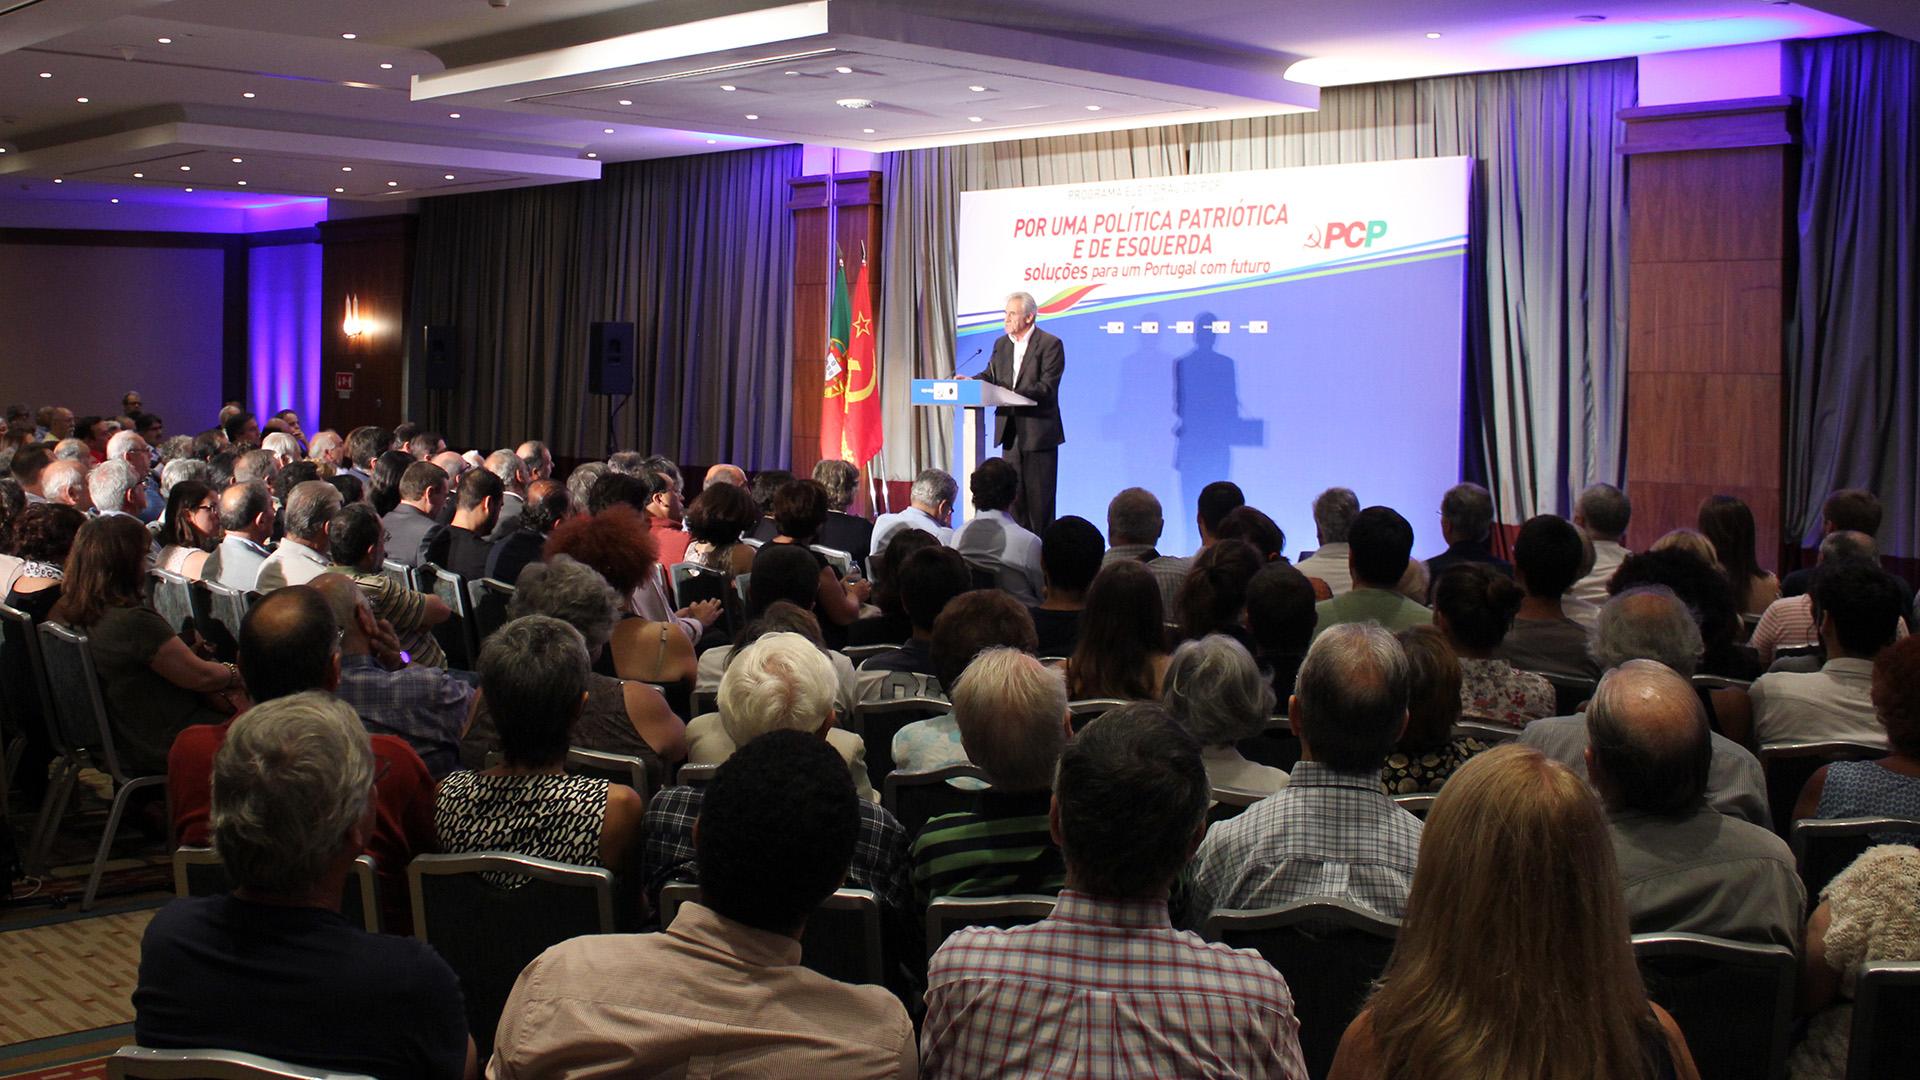 20150707_apresentacao_programa_eleitoral_pcp_js